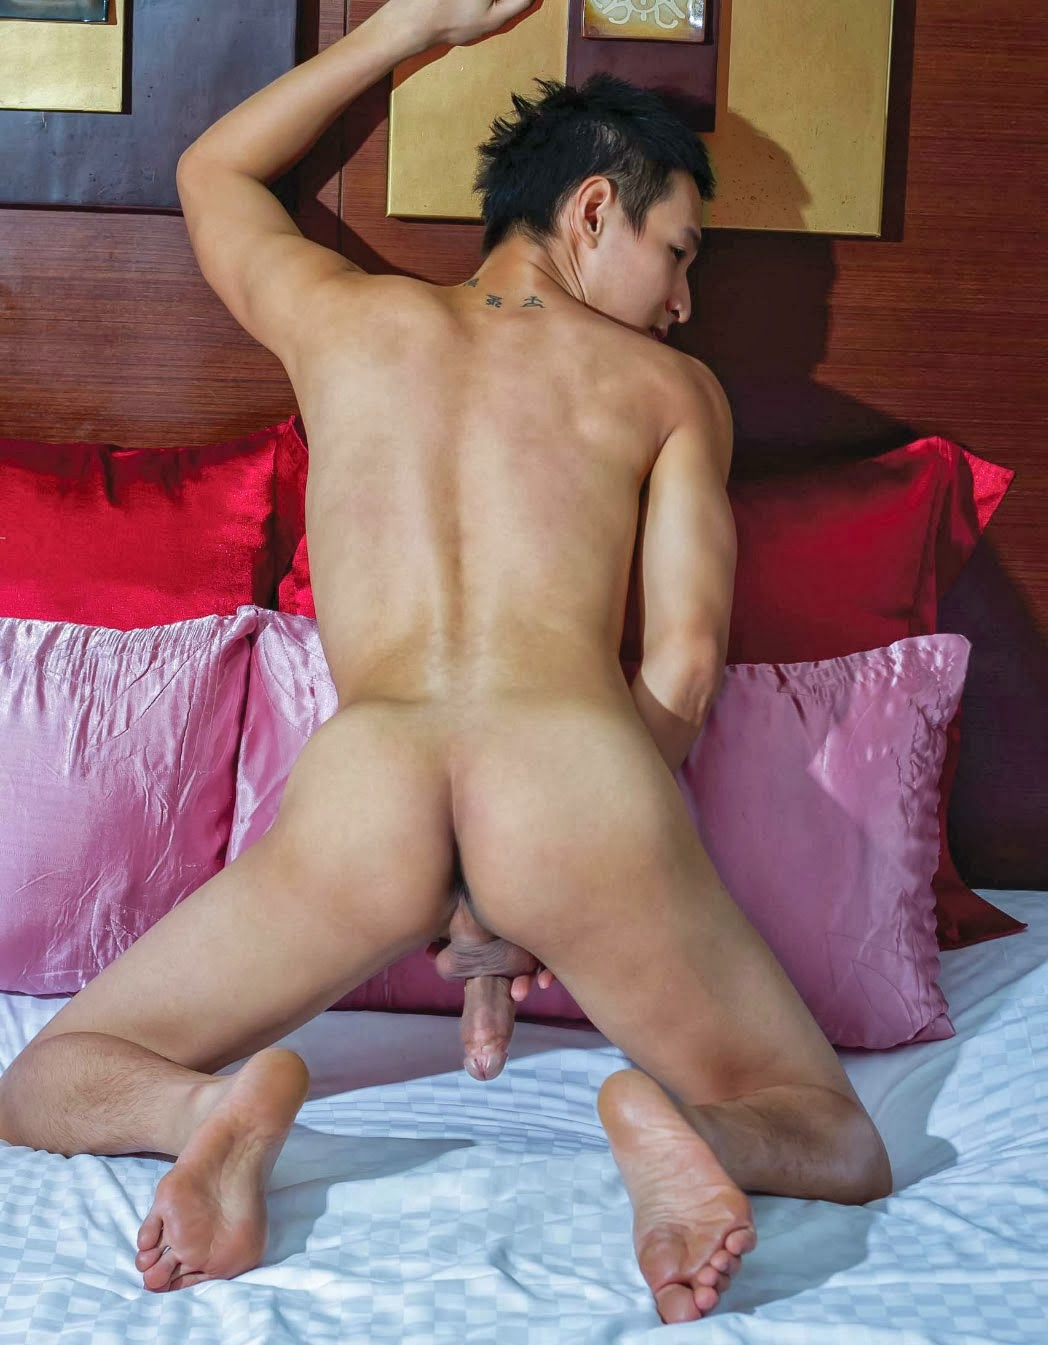 gay trick or treat bareback gay videos